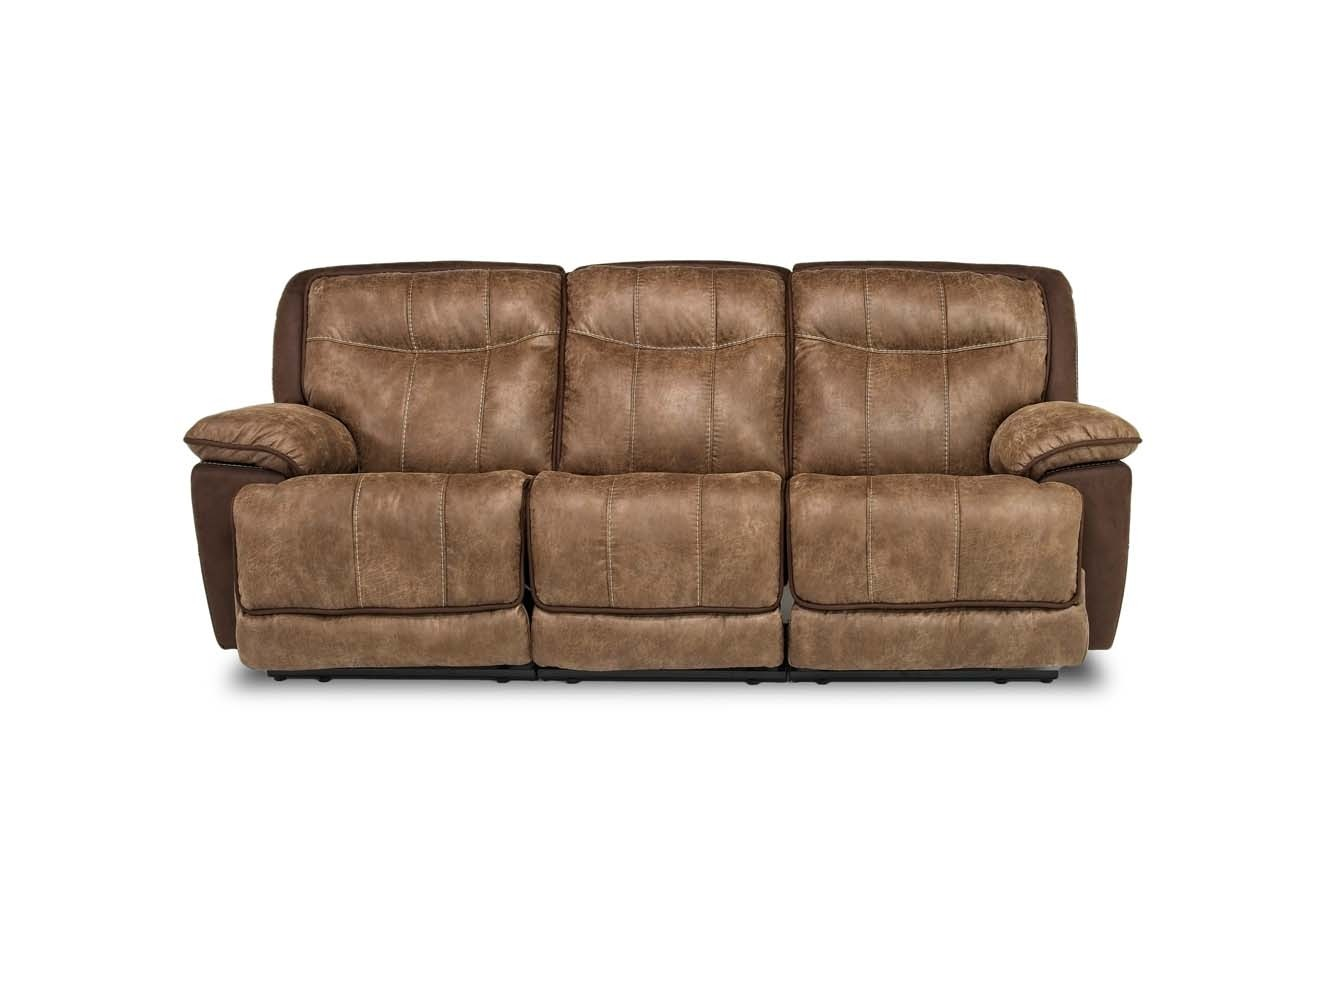 Bubba Triple Reclining Sofa Mor Furniture For Less